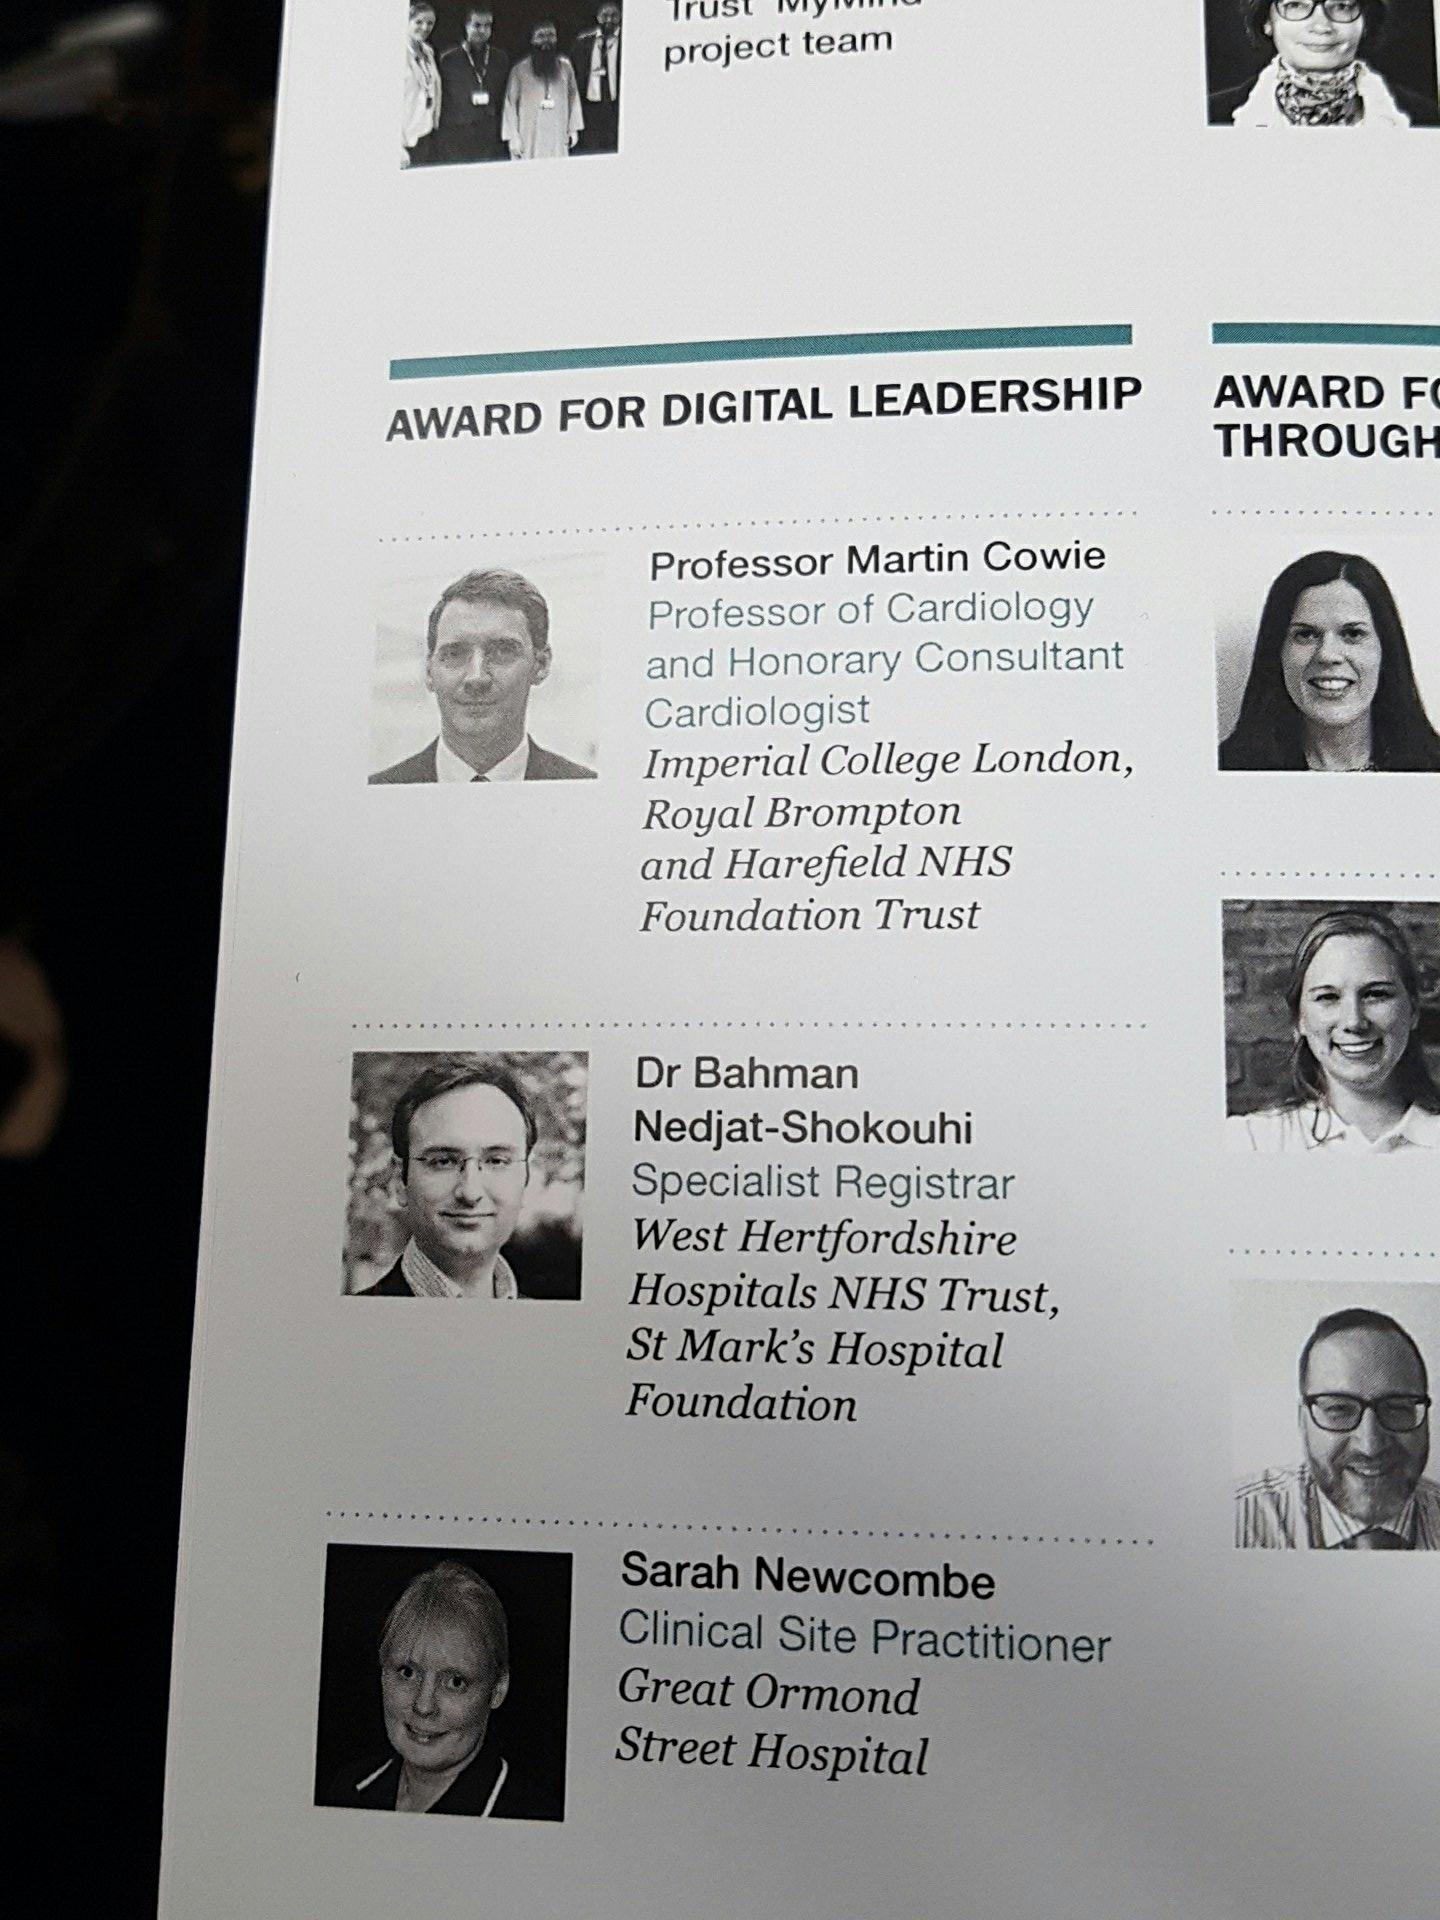 Next up - Digital Leadership 2017 #DHLcollaborate https://t.co/CAxU8jH2cs